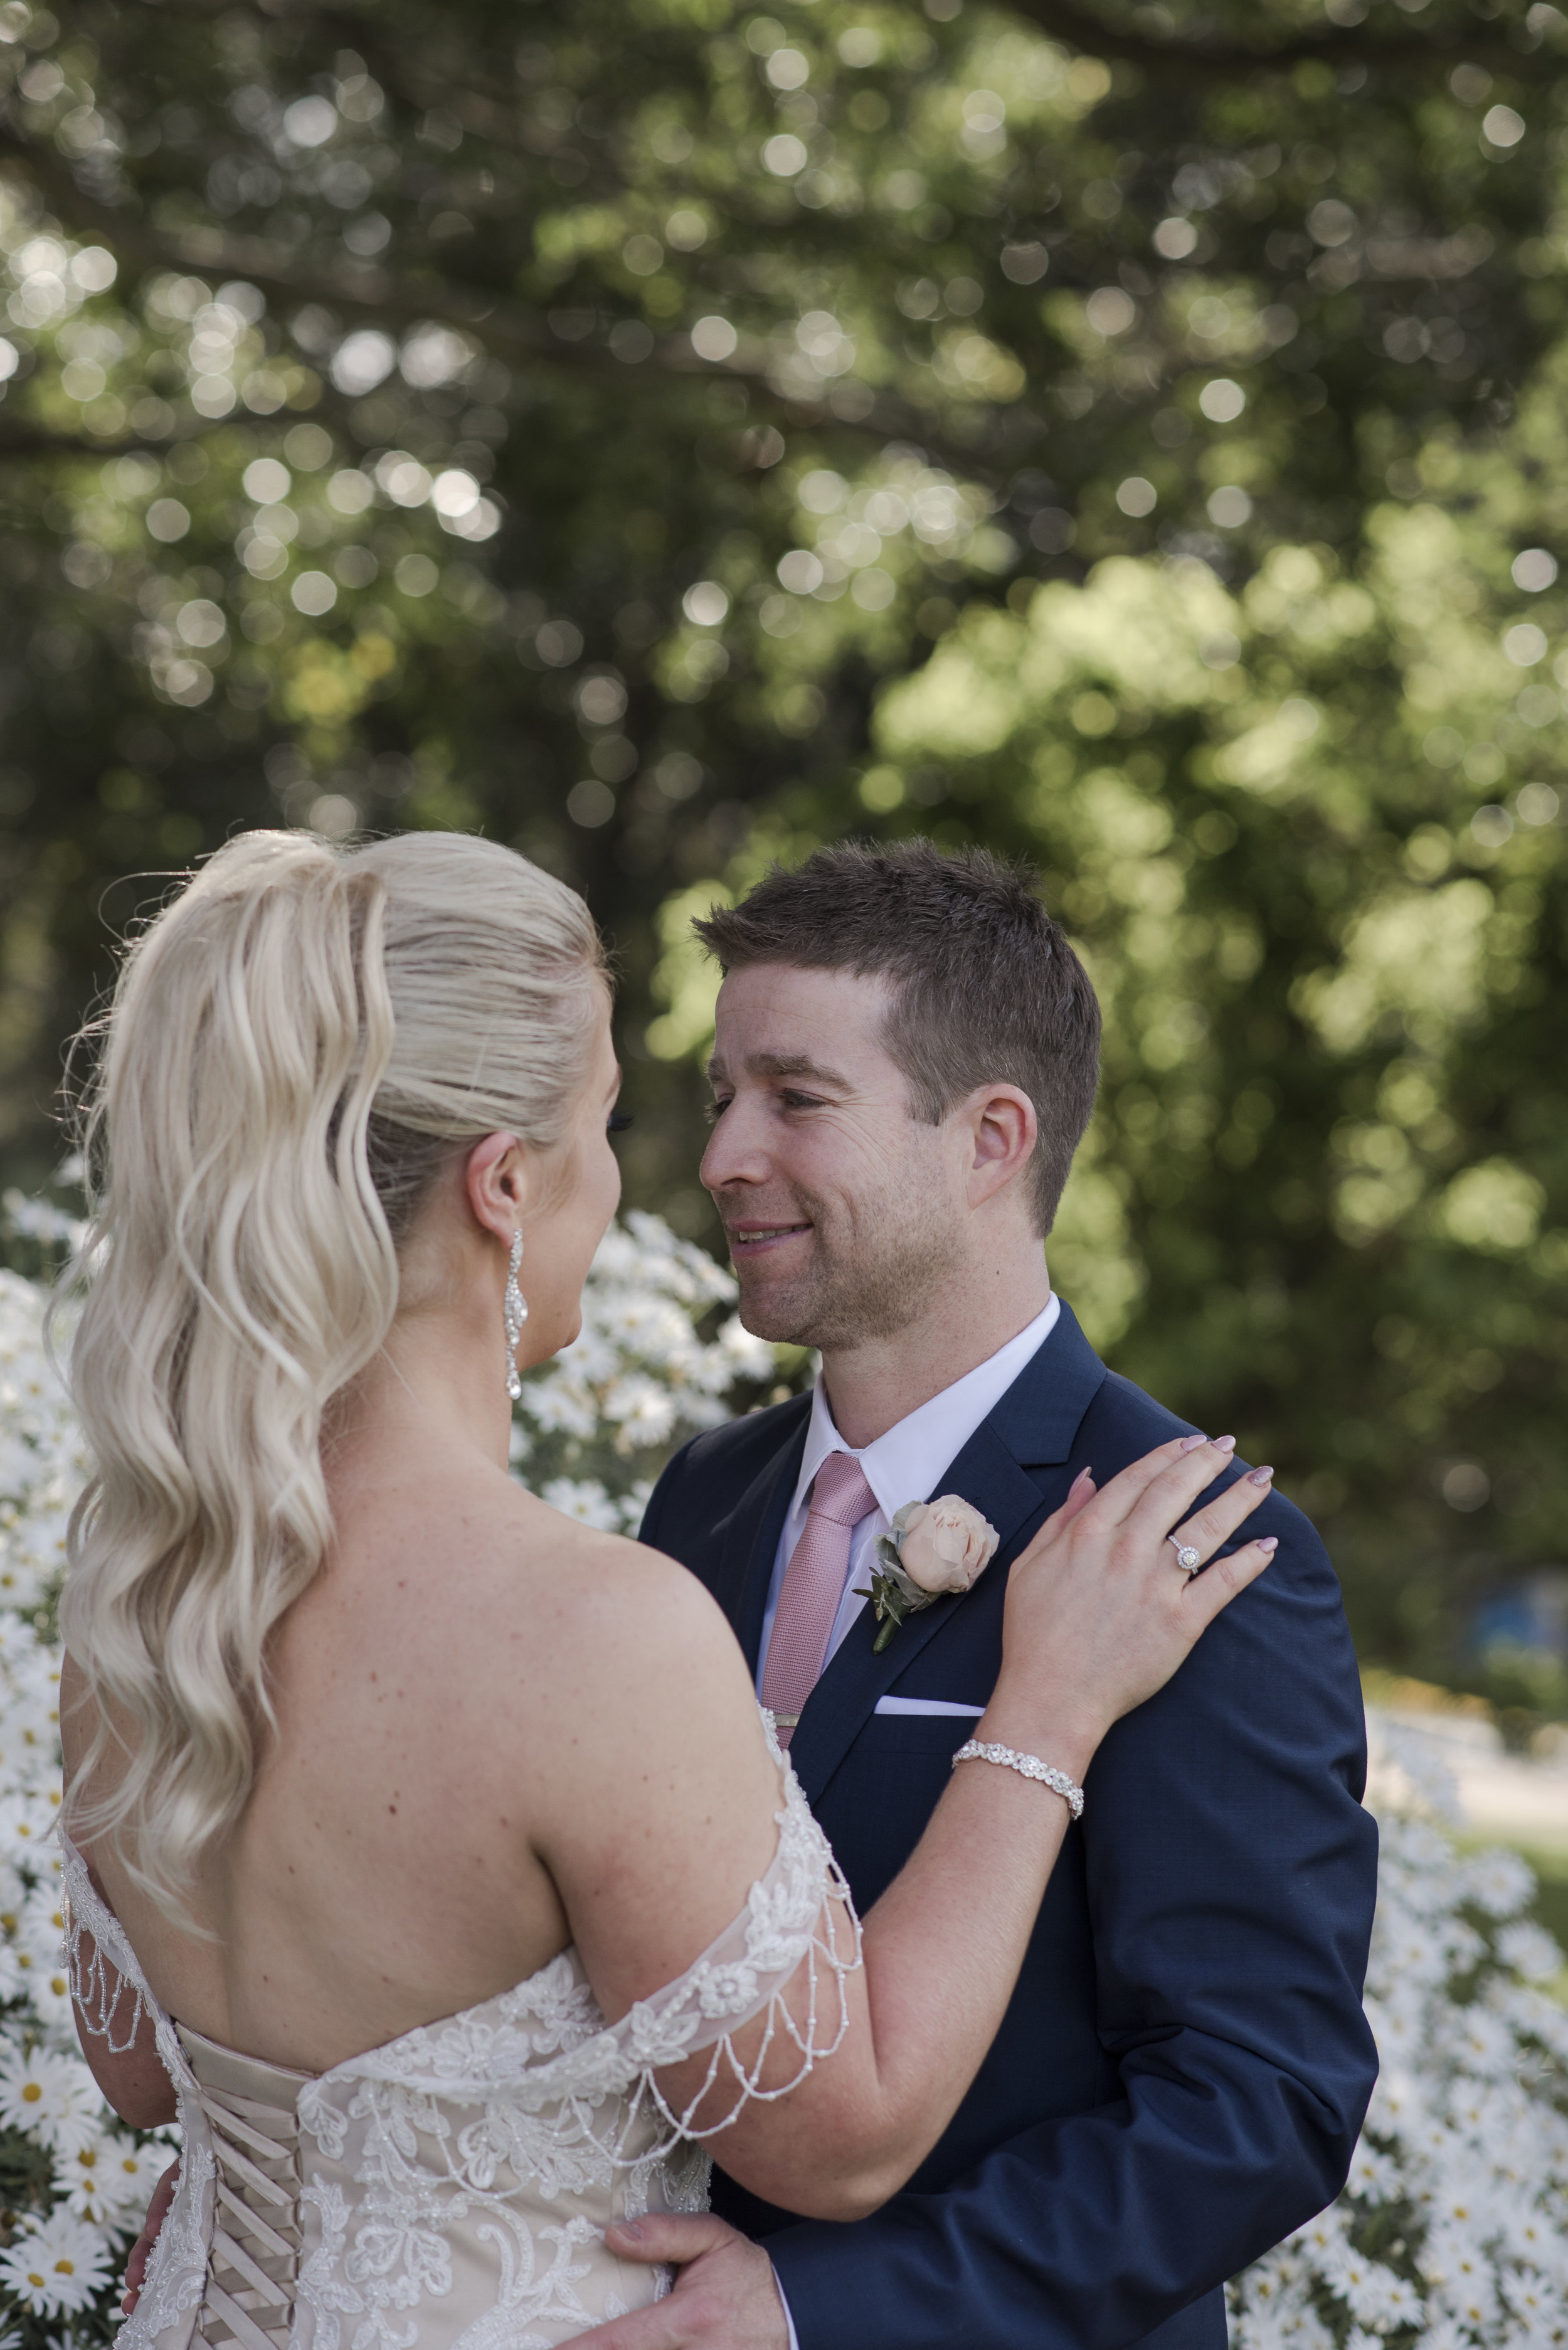 Teagan_Mayflower Weddings Photography_048.jpg